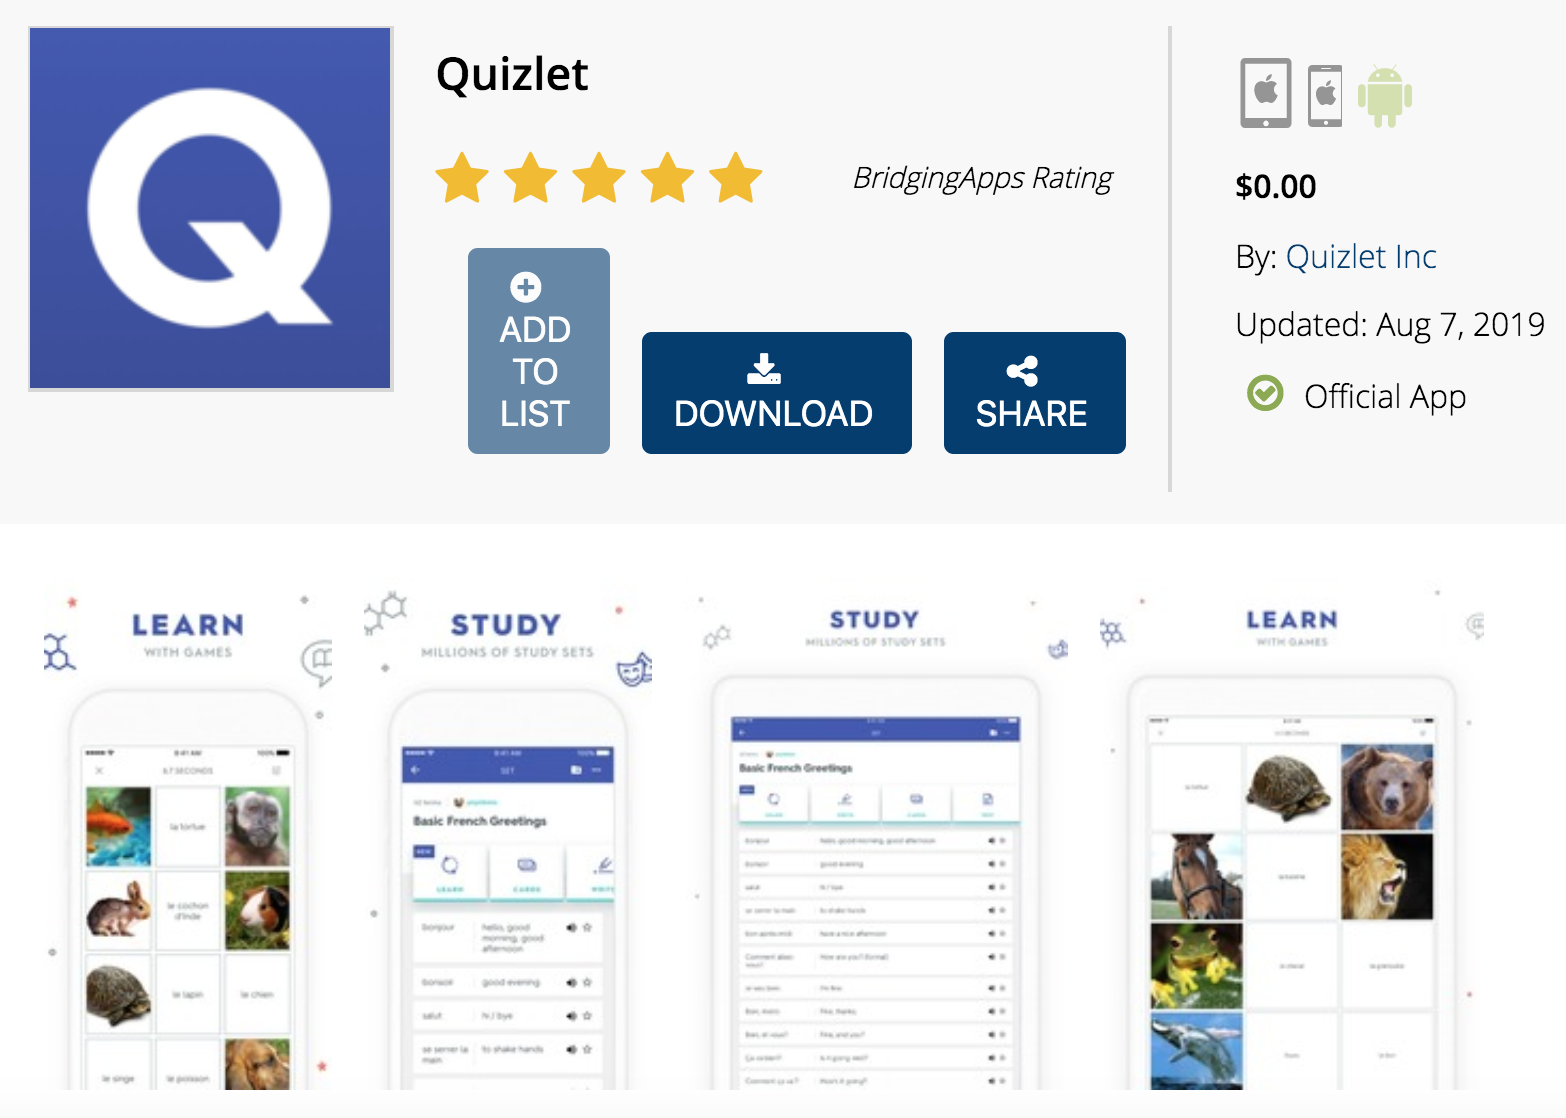 BridgingApps Back To School App   Quizlet - BridgingApps